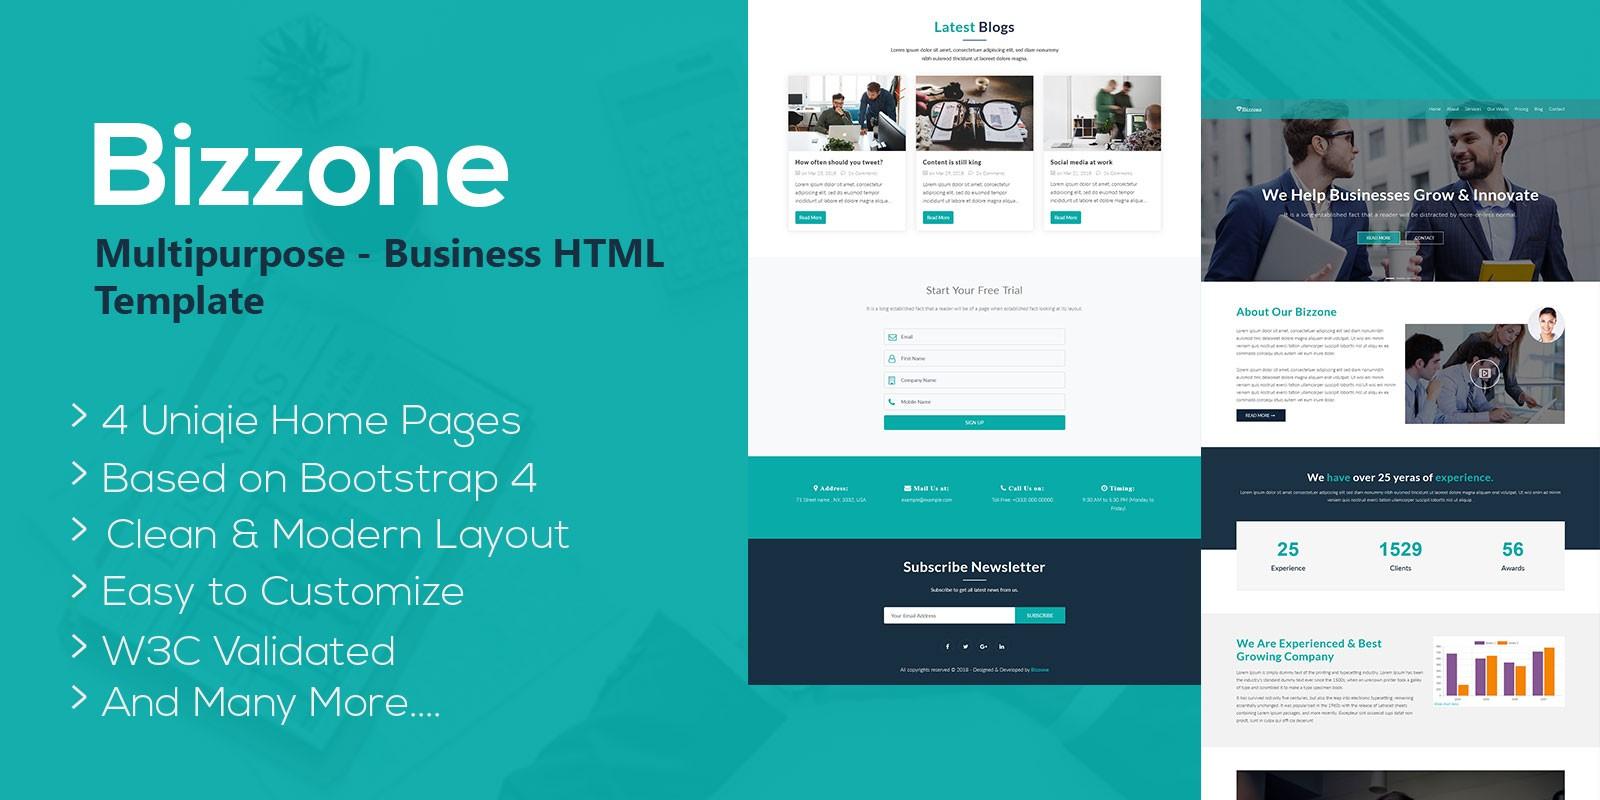 Bizzone - Multipurpose Business HTML5 Landing Page